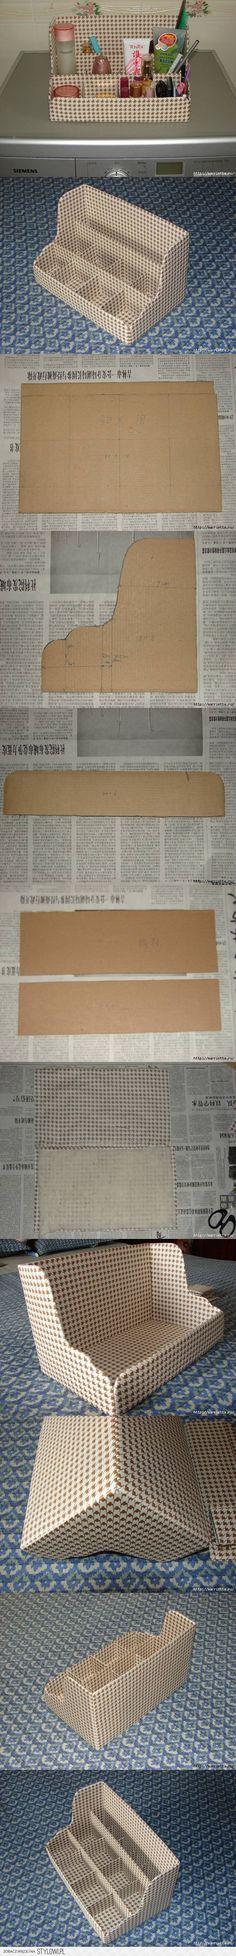 DIY Cardboard Shelves Organizer DIY Projects   UsefulDI… na Stylowi.pl